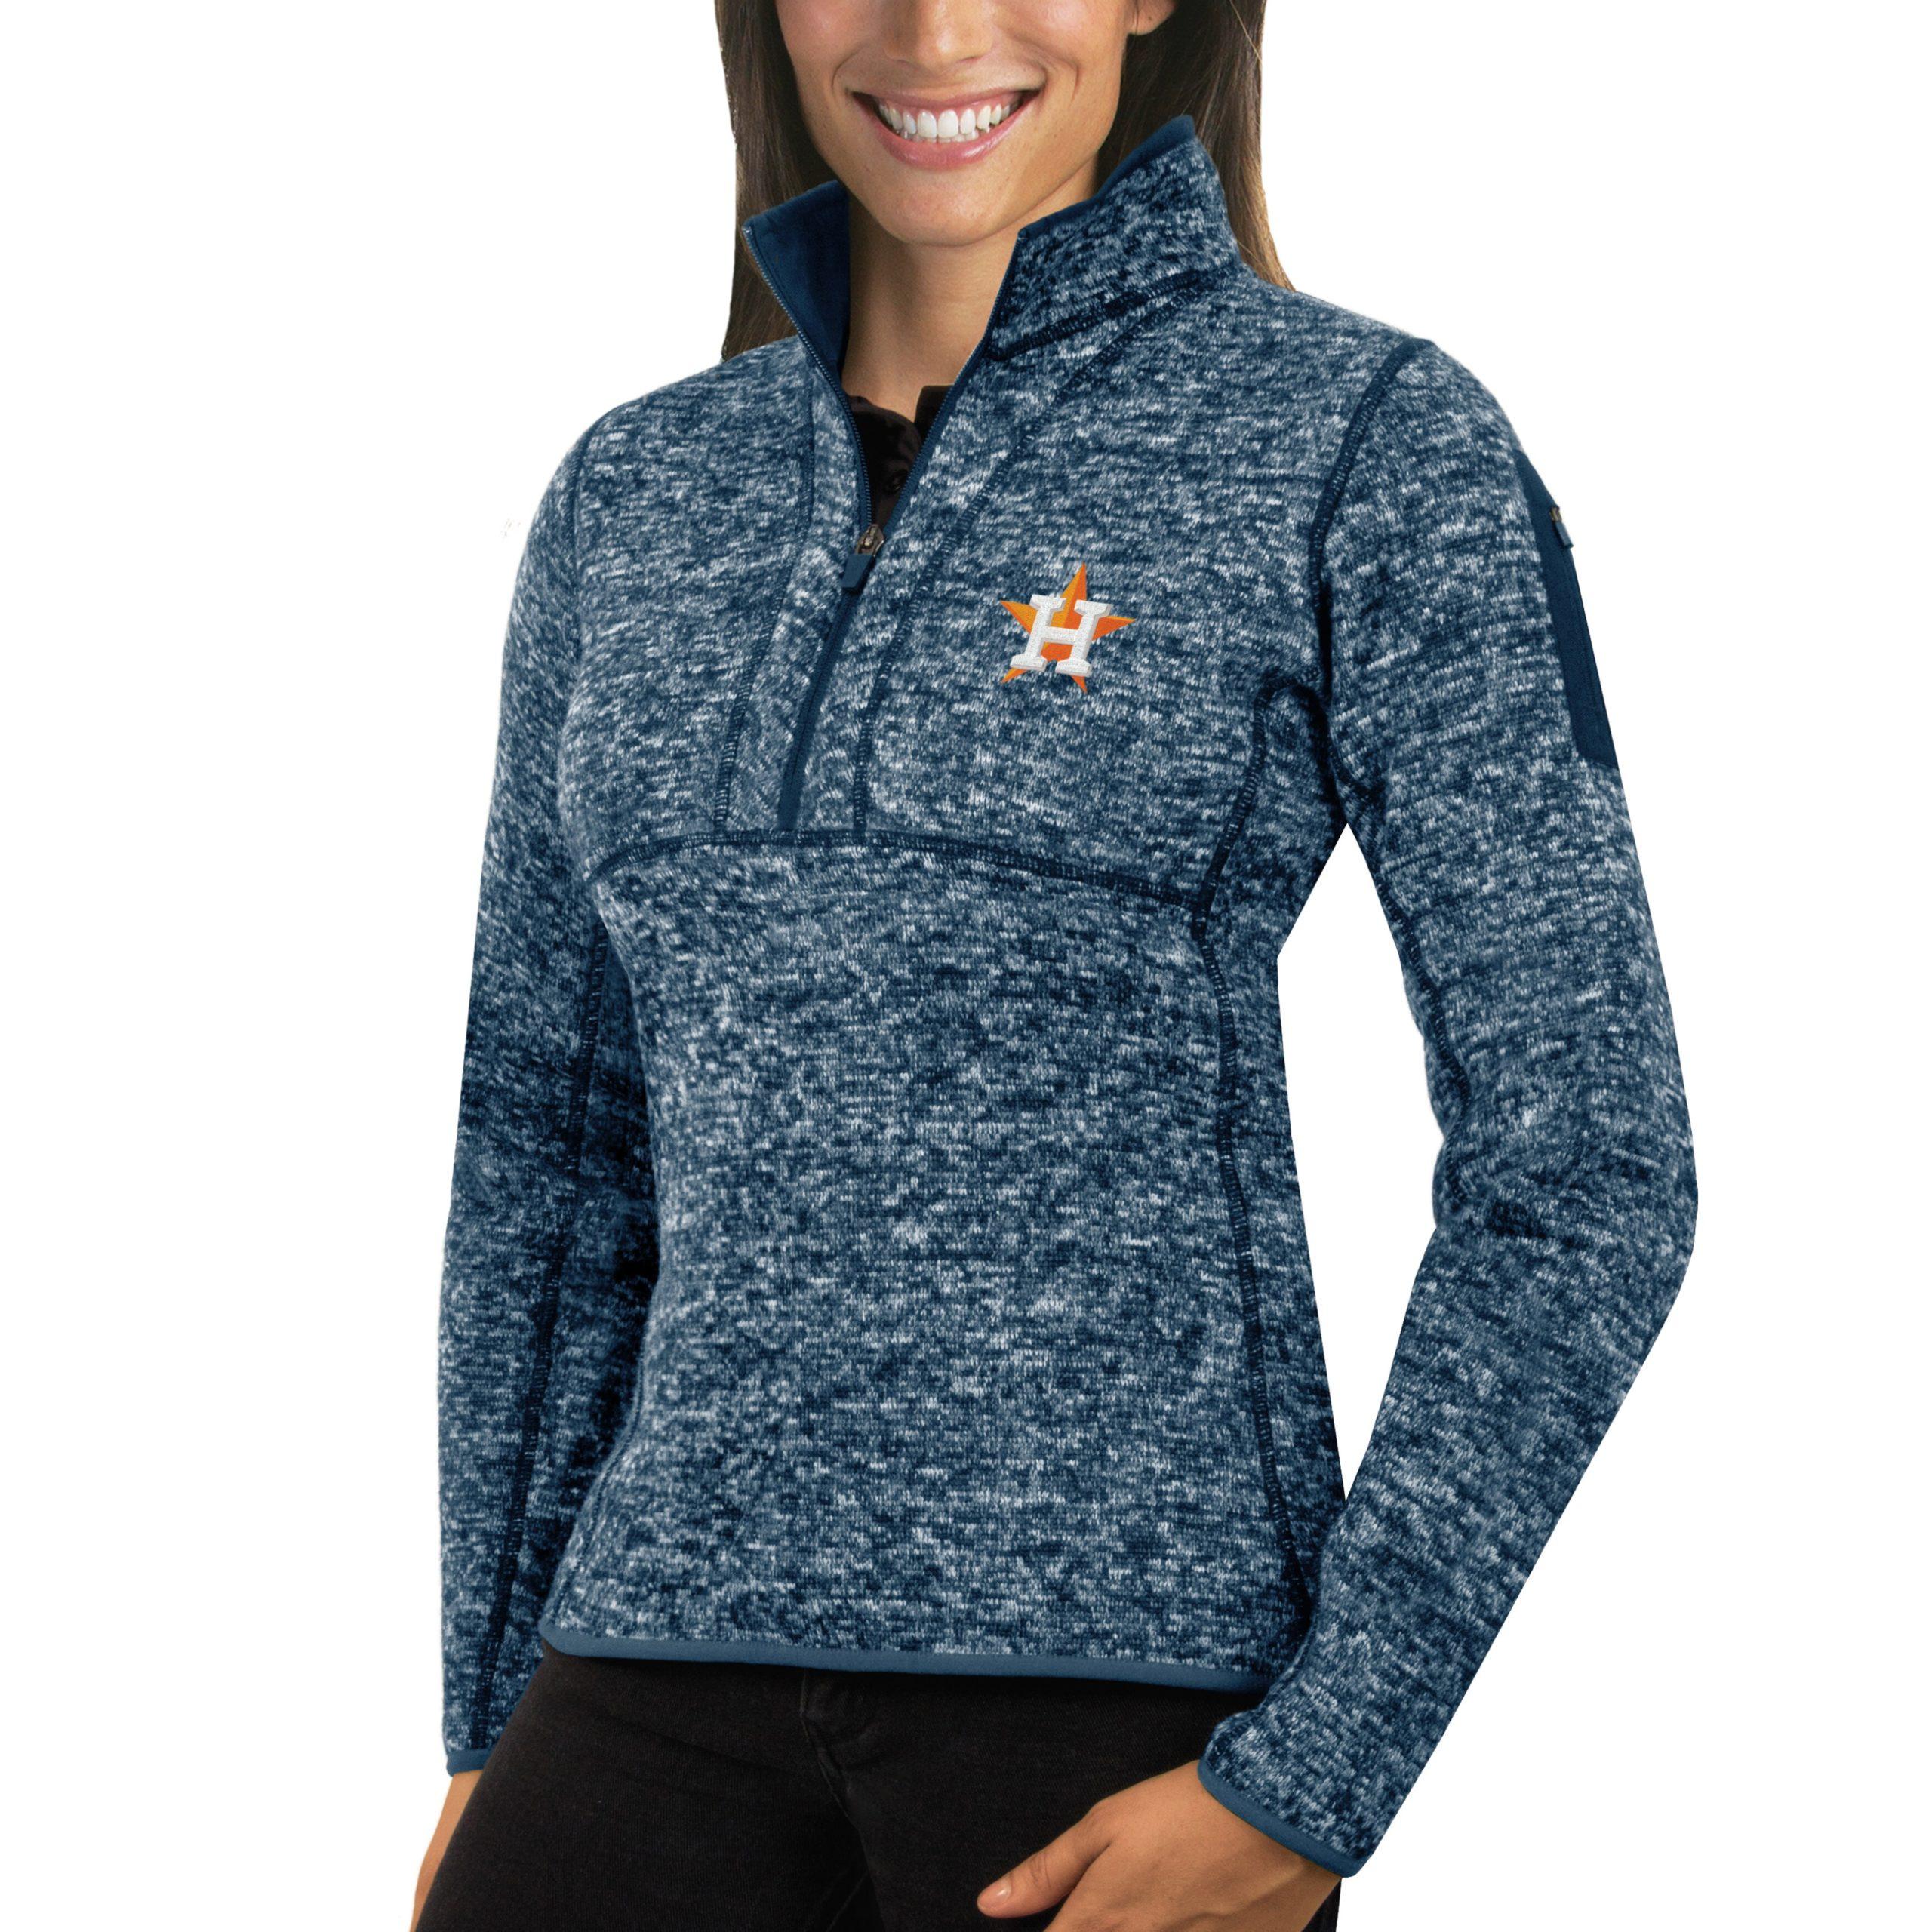 Houston Astros Antigua Women's Fortune Half-Zip Pullover Sweater - Heathered Navy